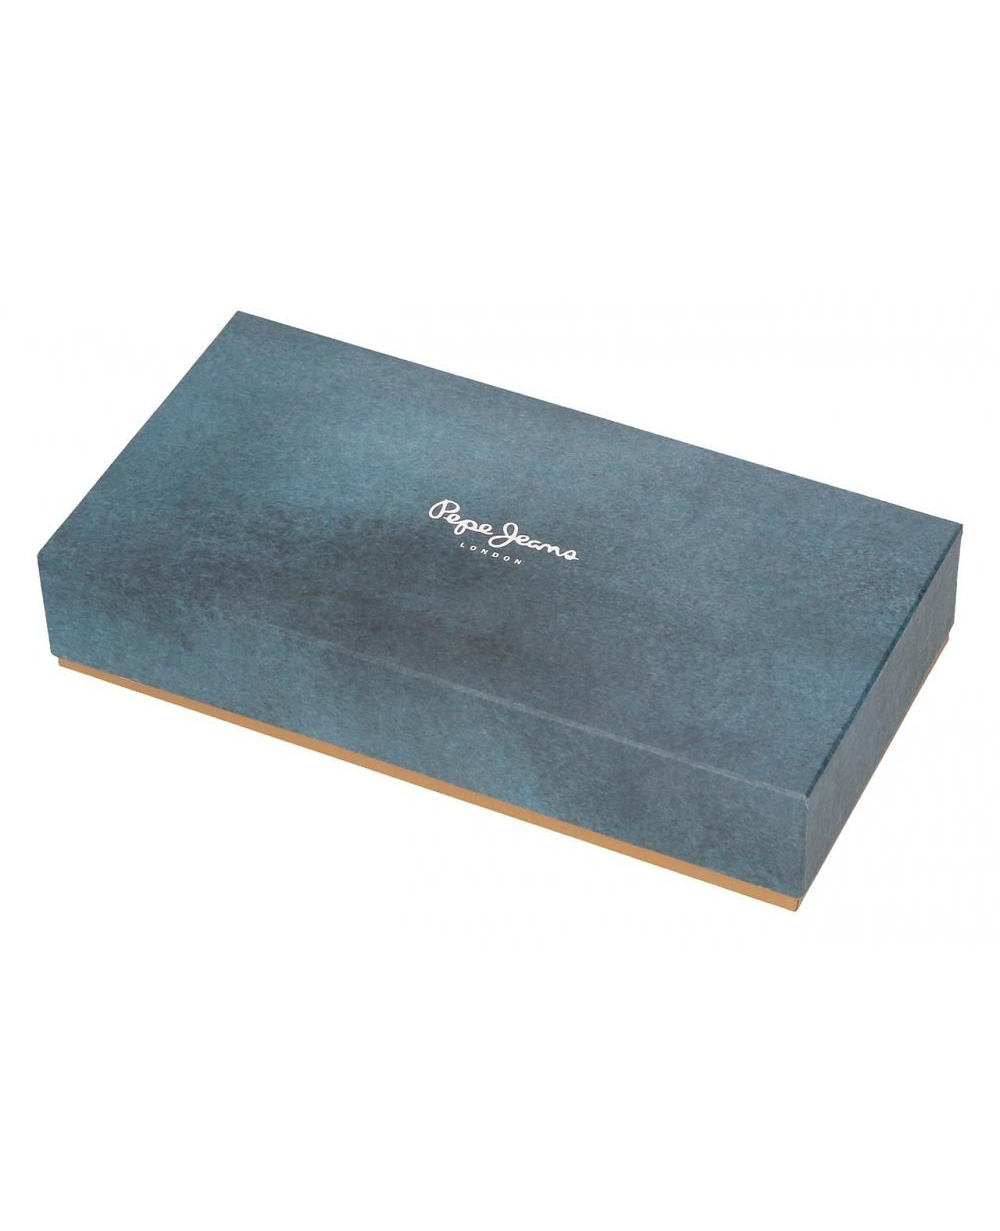 ea368077c Cartera Double Coral Pepe Jeans Naranja 20cm | Maletia.com